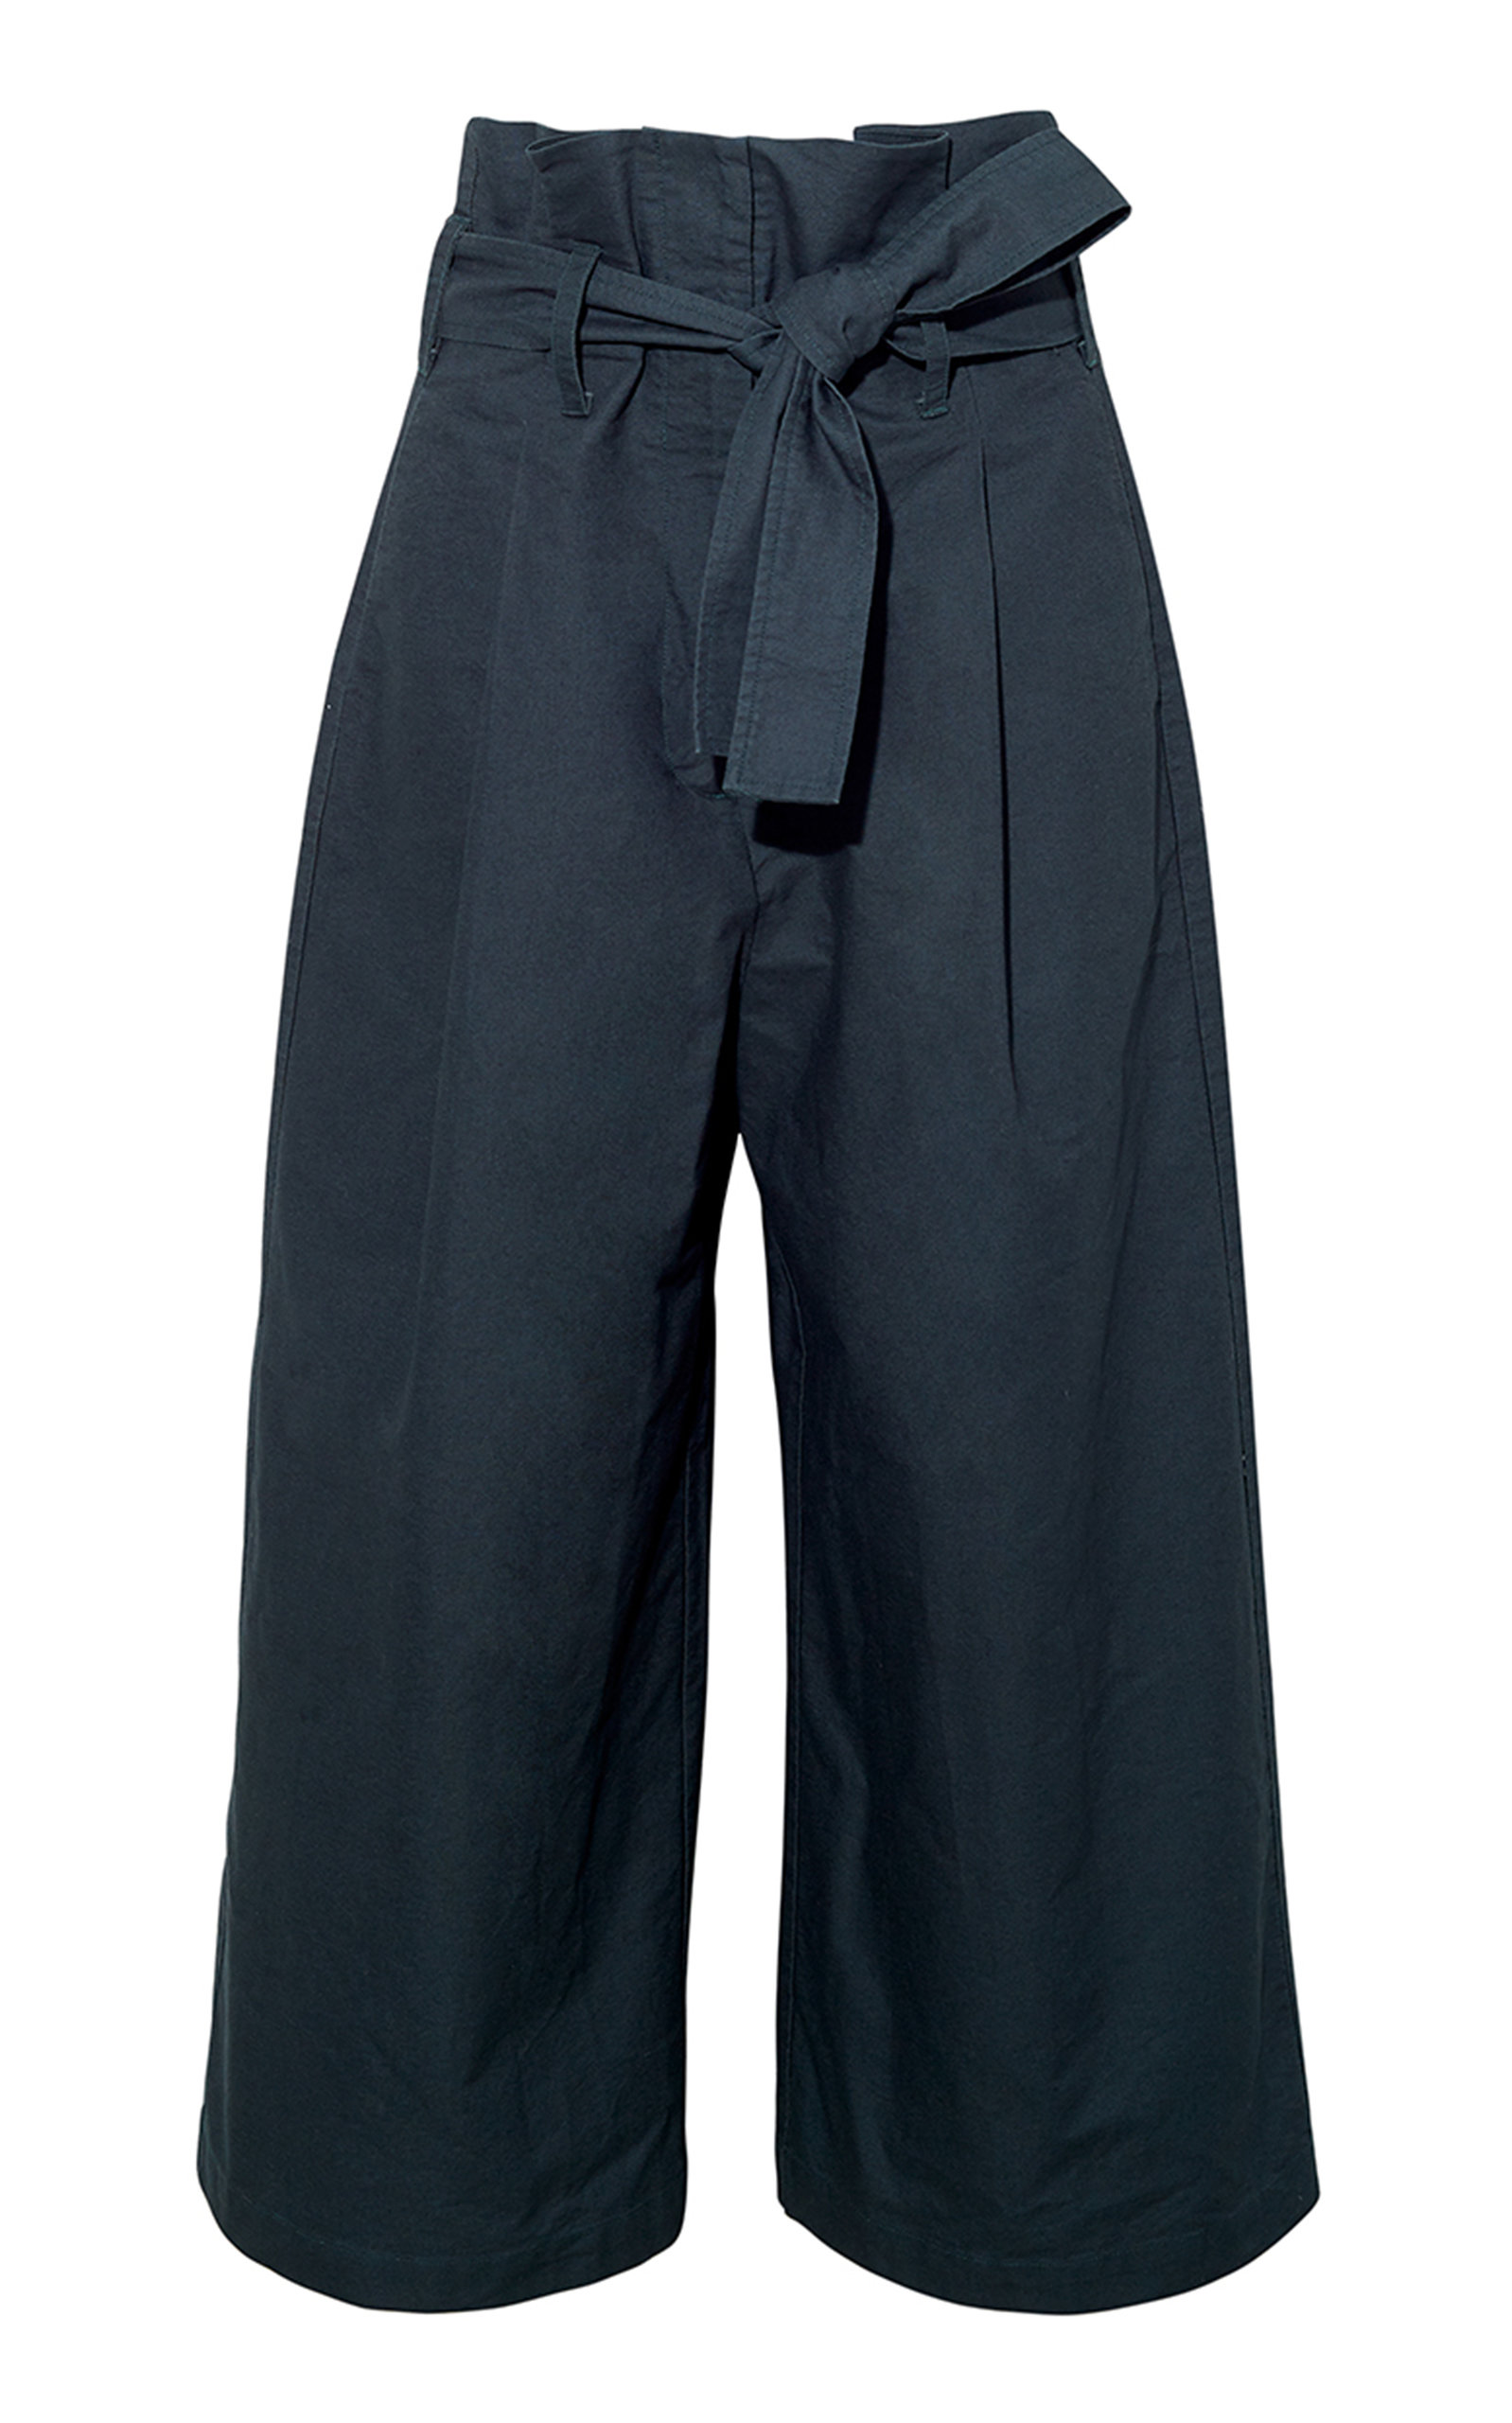 Women's Whittaker Cotton Canvas Wide-Leg Pants